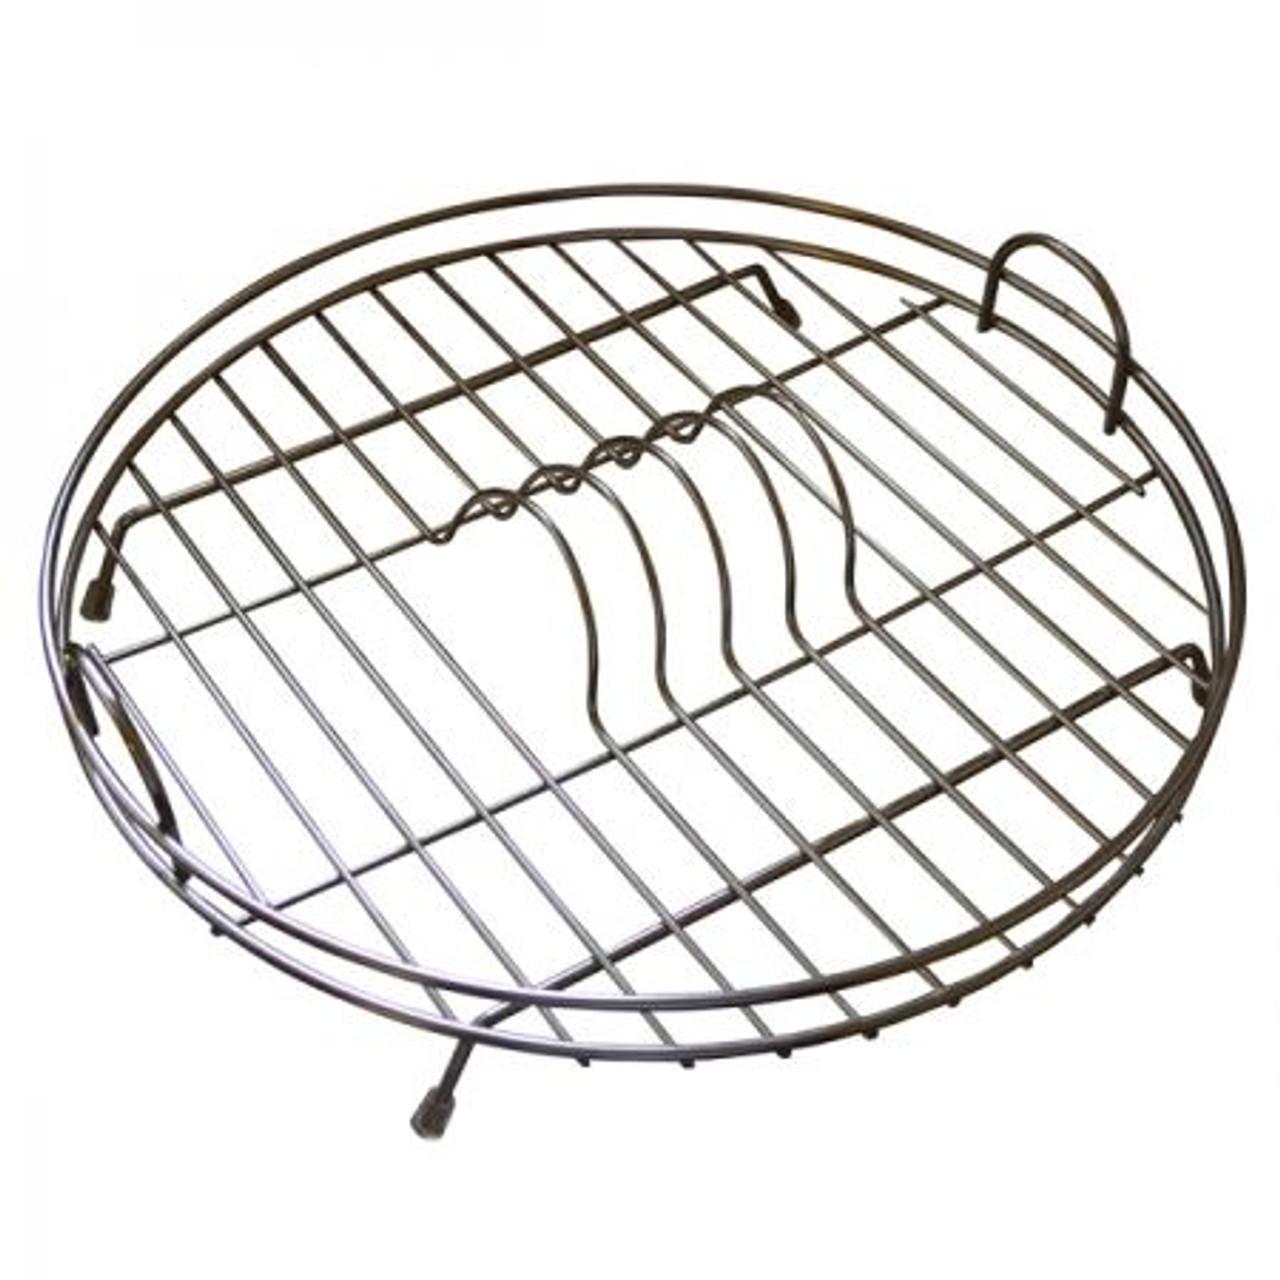 Delfinware Circular Drainer Stainless Steel